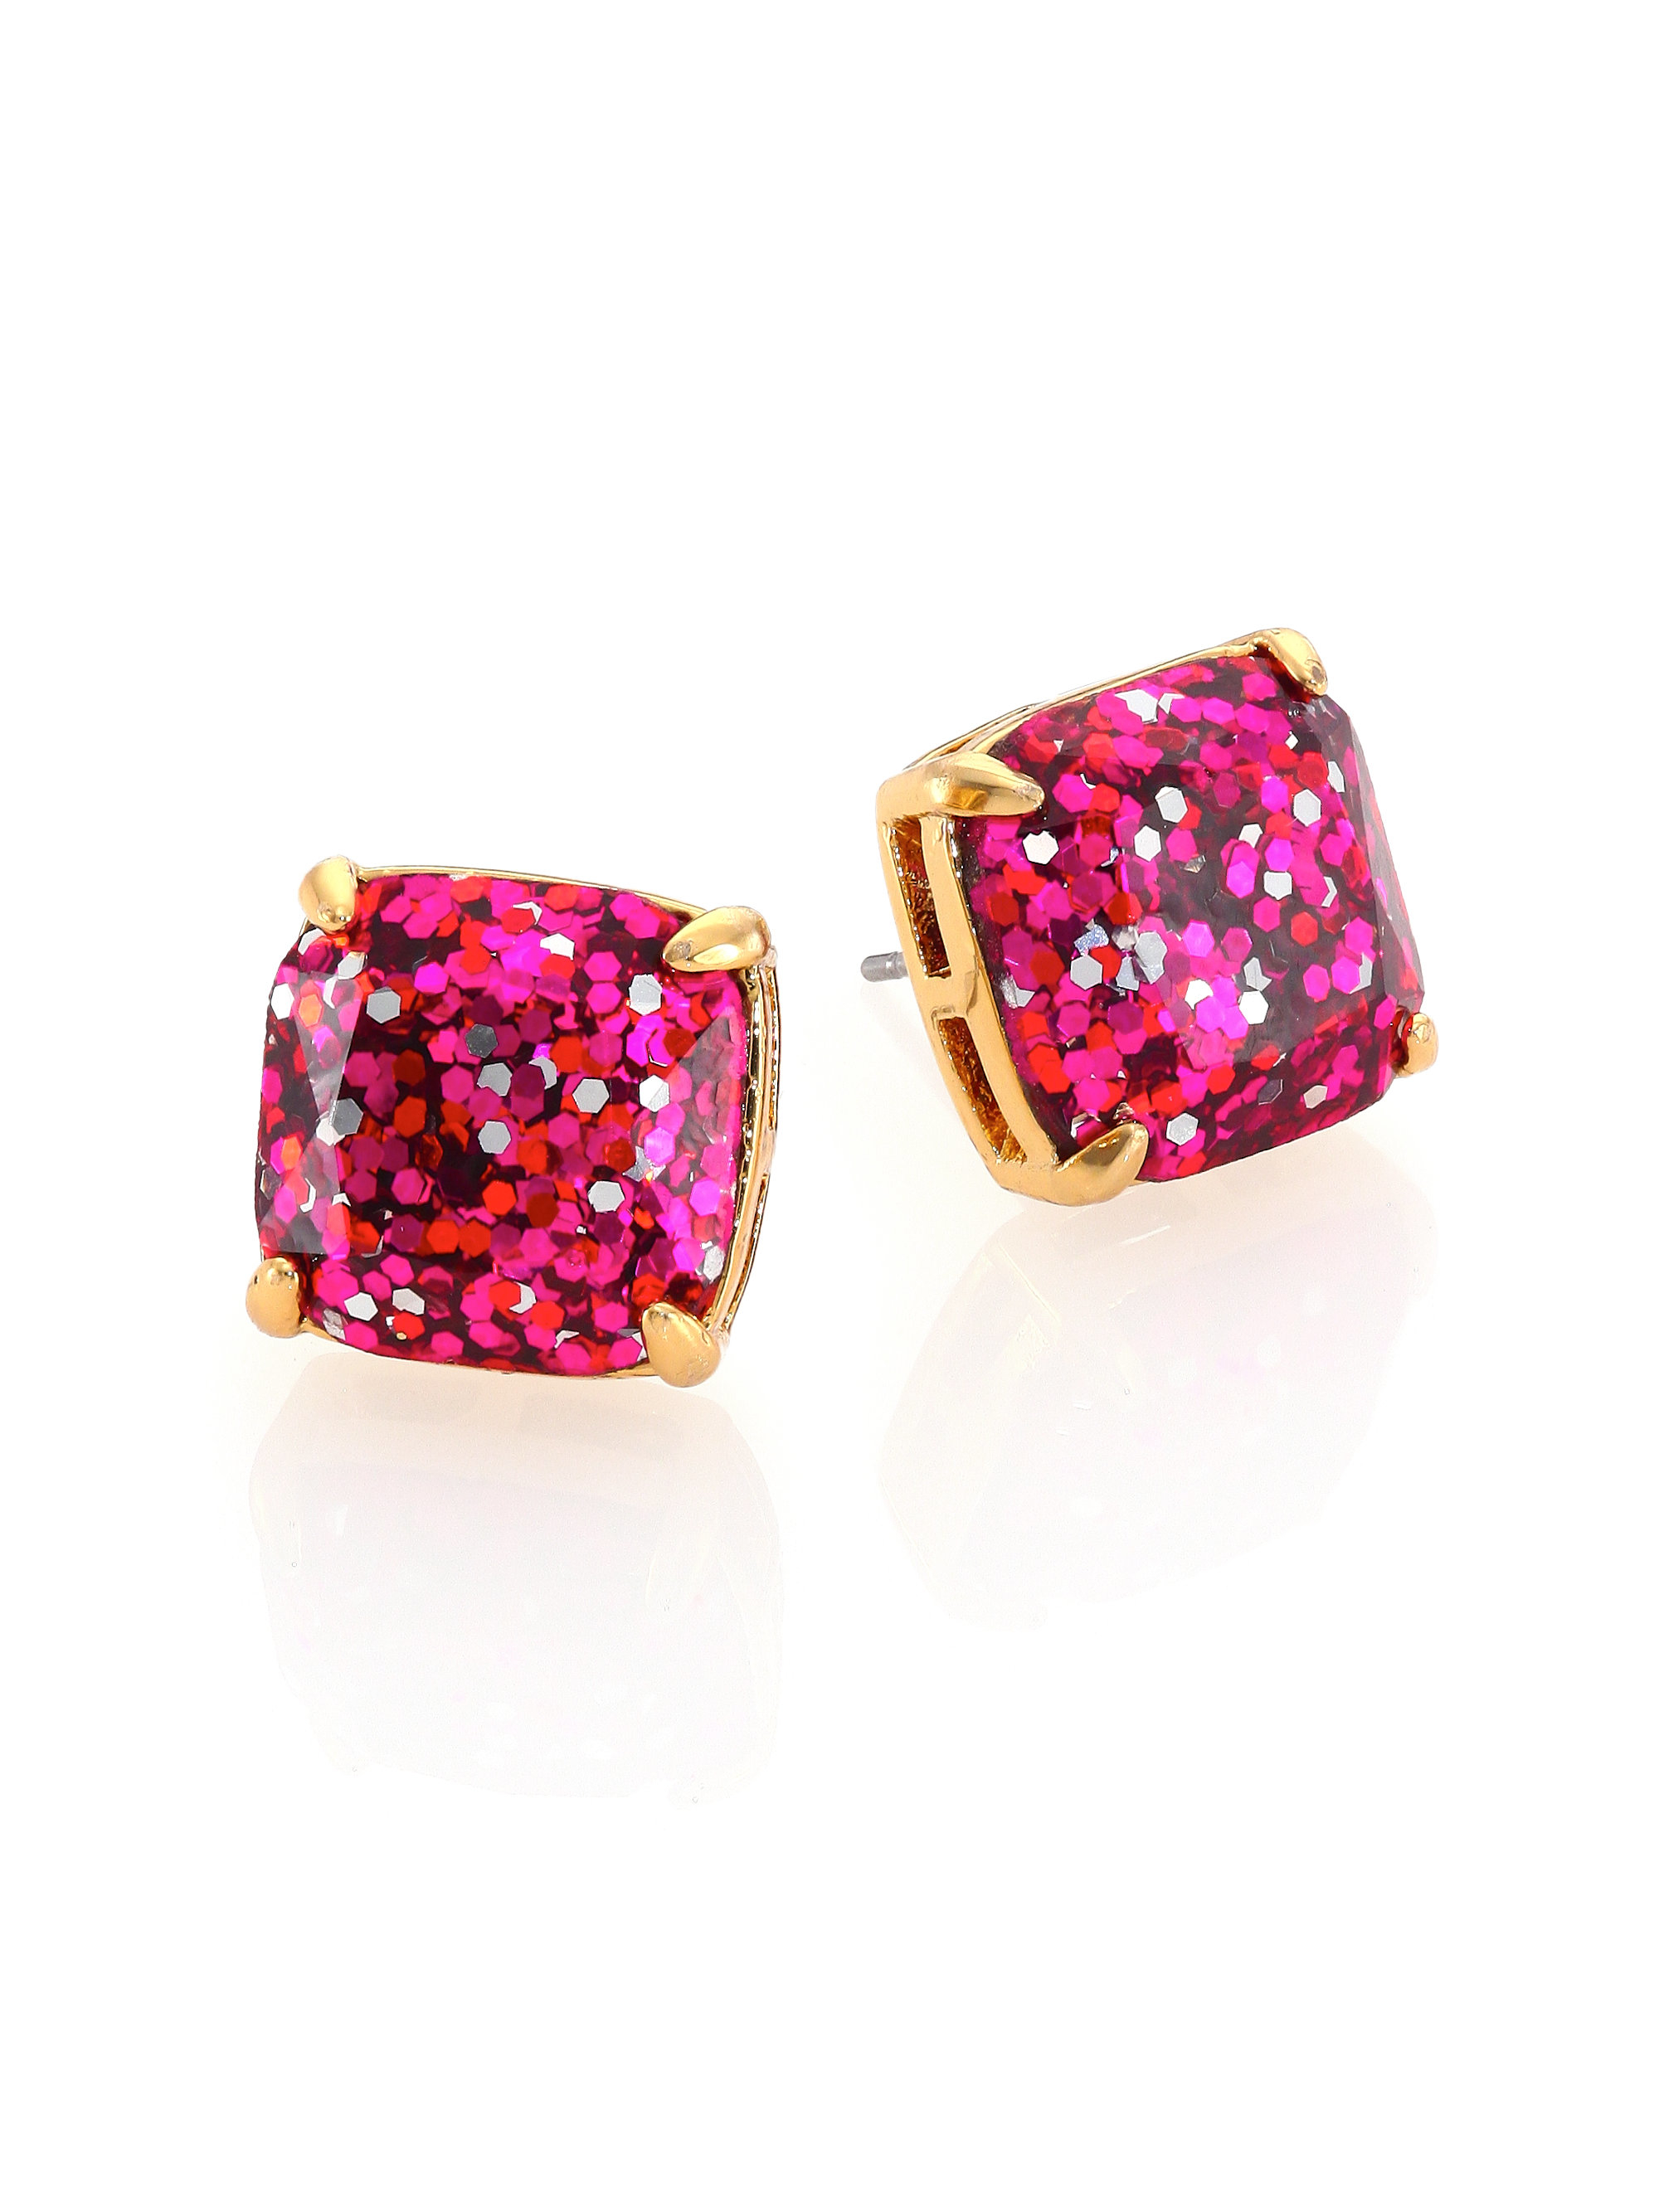 774f41b03 Lyst - Kate Spade Glitter Square Stud Earrings/fucshia in Metallic